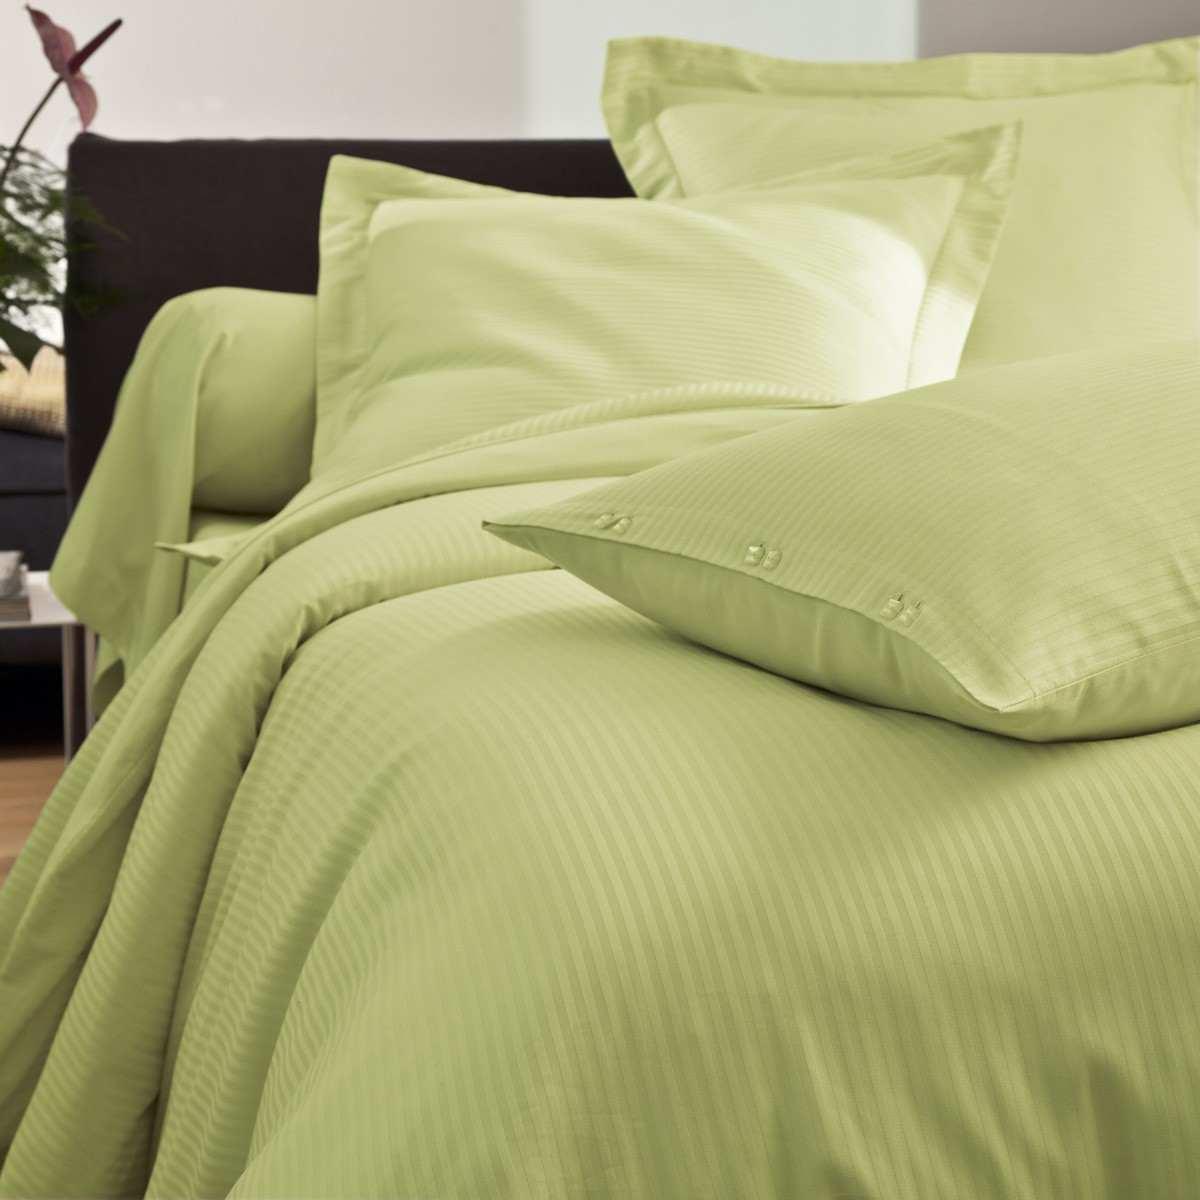 parure satin jacquard tradition des vosges. Black Bedroom Furniture Sets. Home Design Ideas